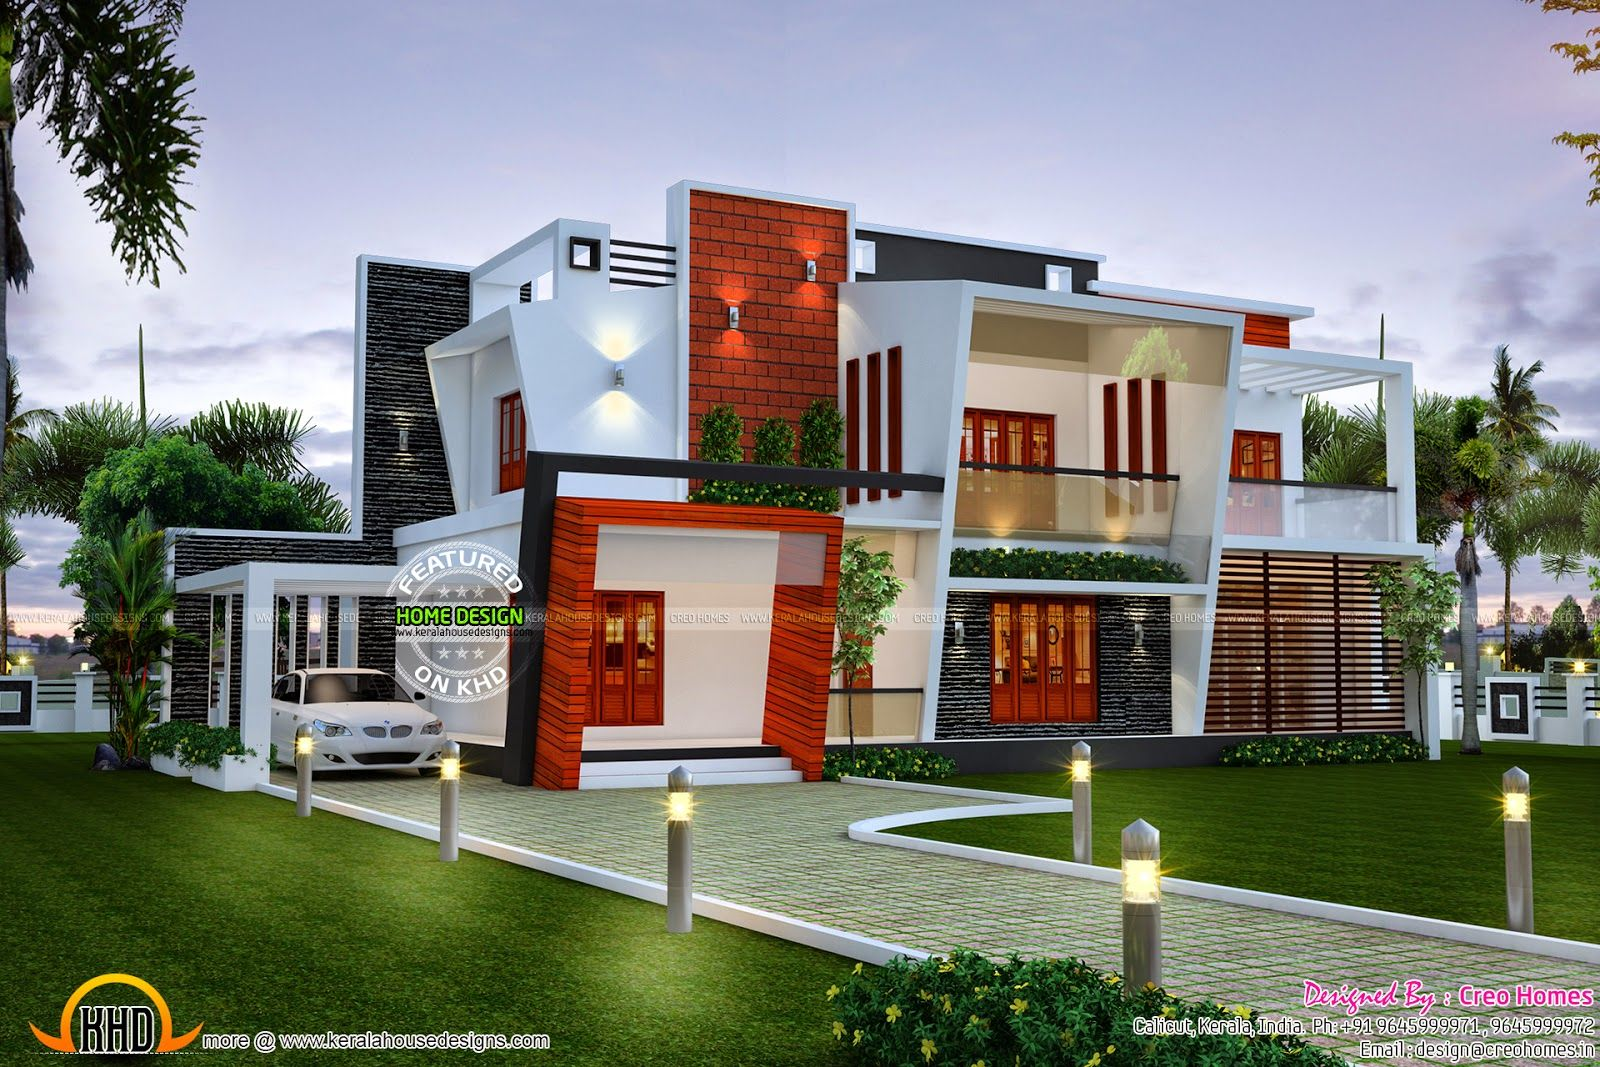 Beautiful Contemporary Home Jpg 1 600 1 067 Pixels